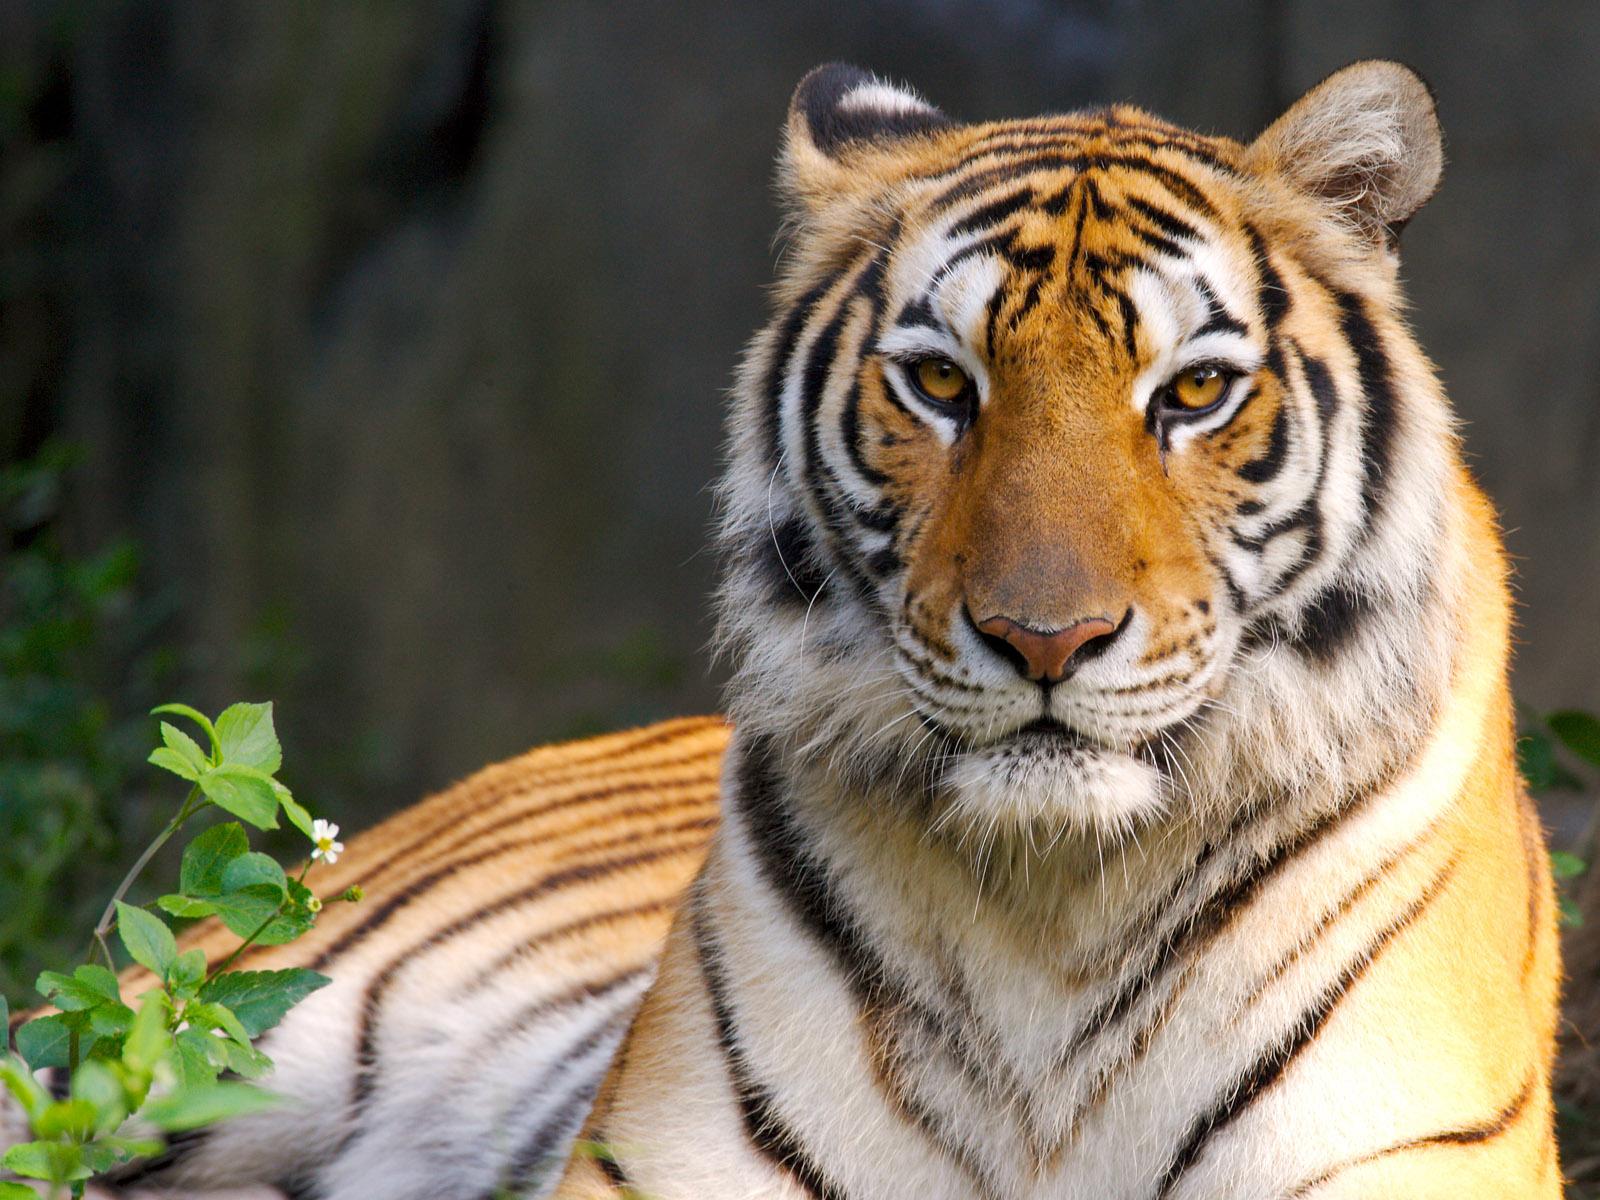 tiger - photo #21